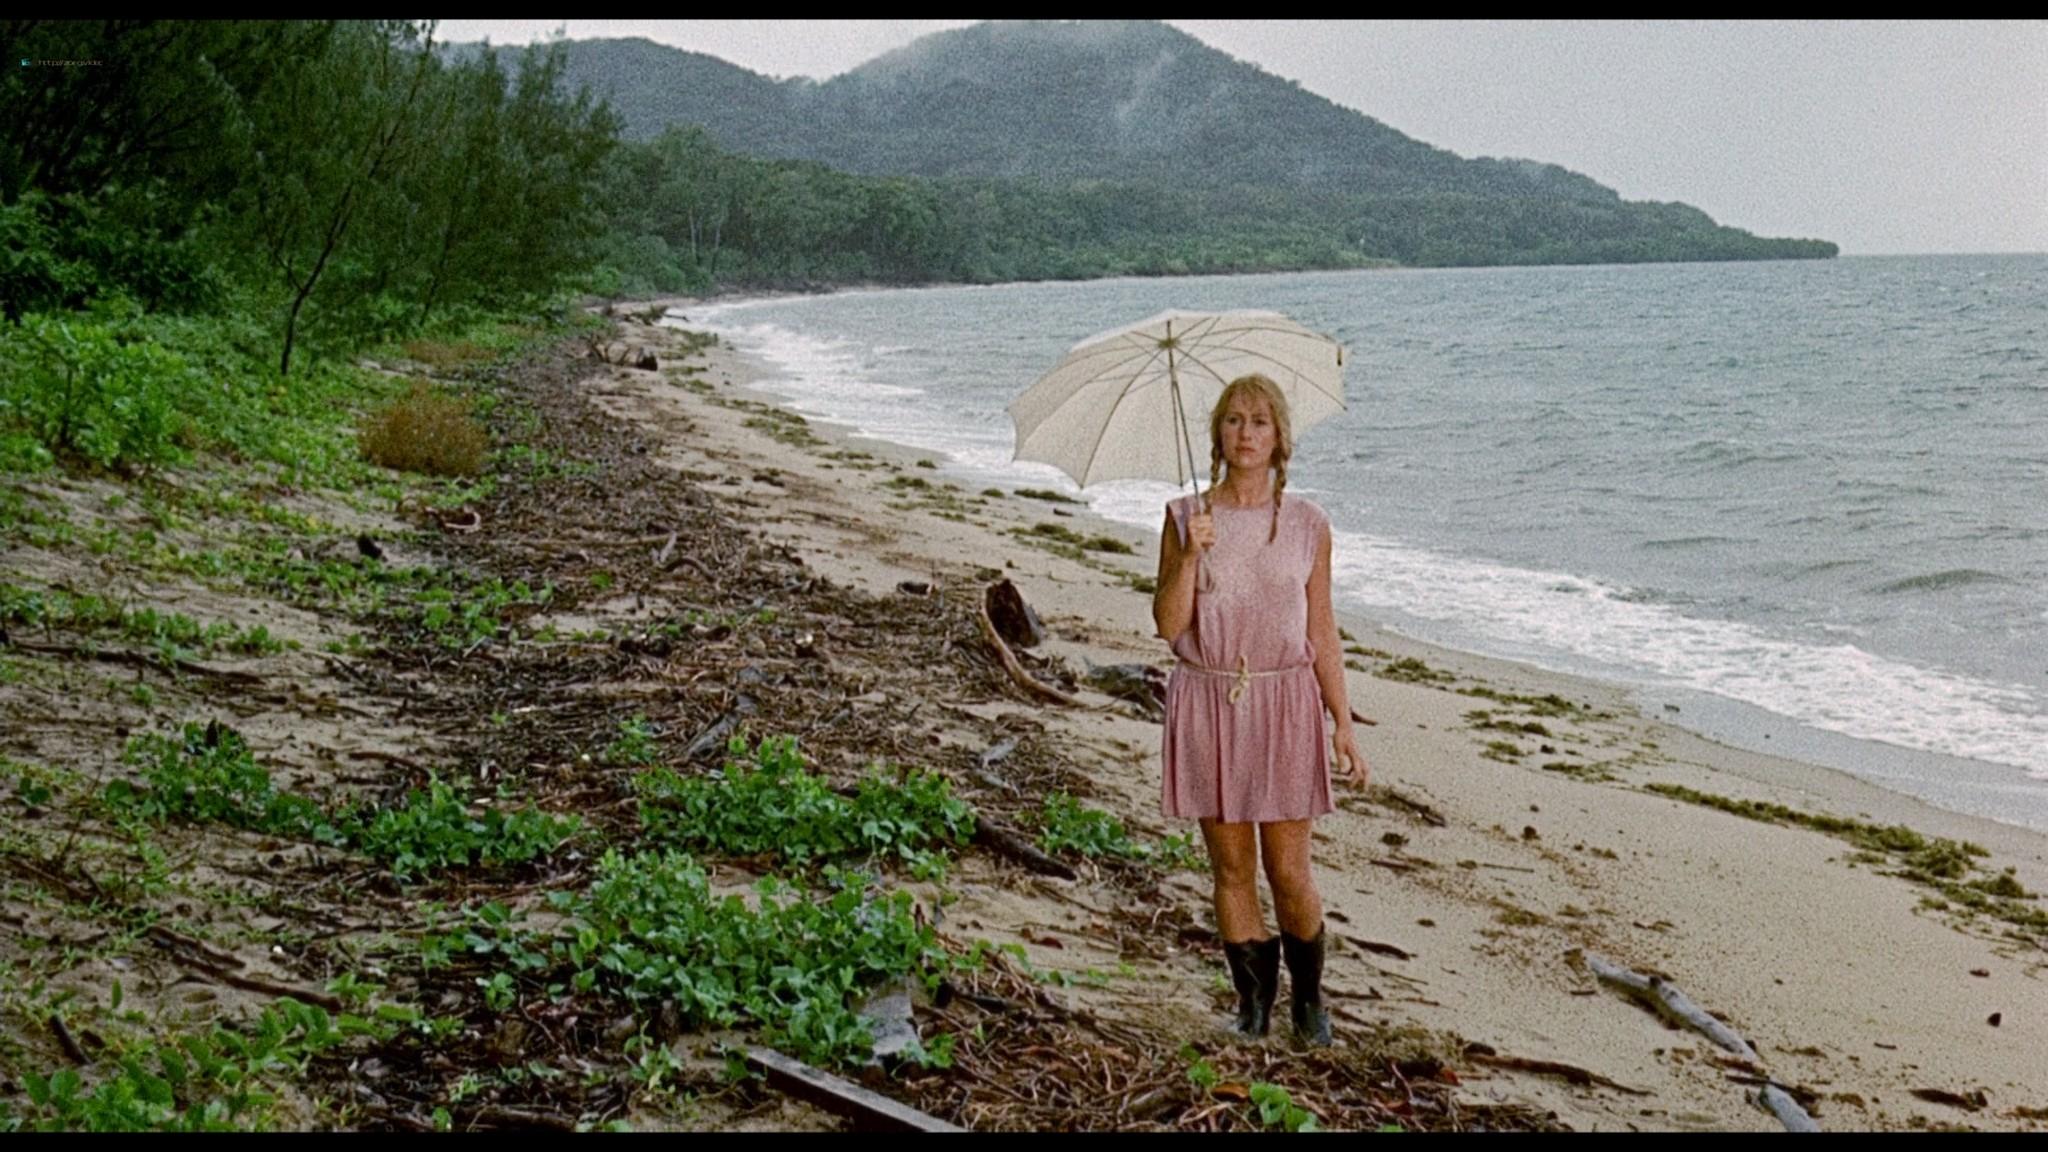 Helen Mirren nude skinny dipping Clarissa Kaye-Mason nude sex - Age of Consent (1969) HD 1080p BluRay Remux (8)